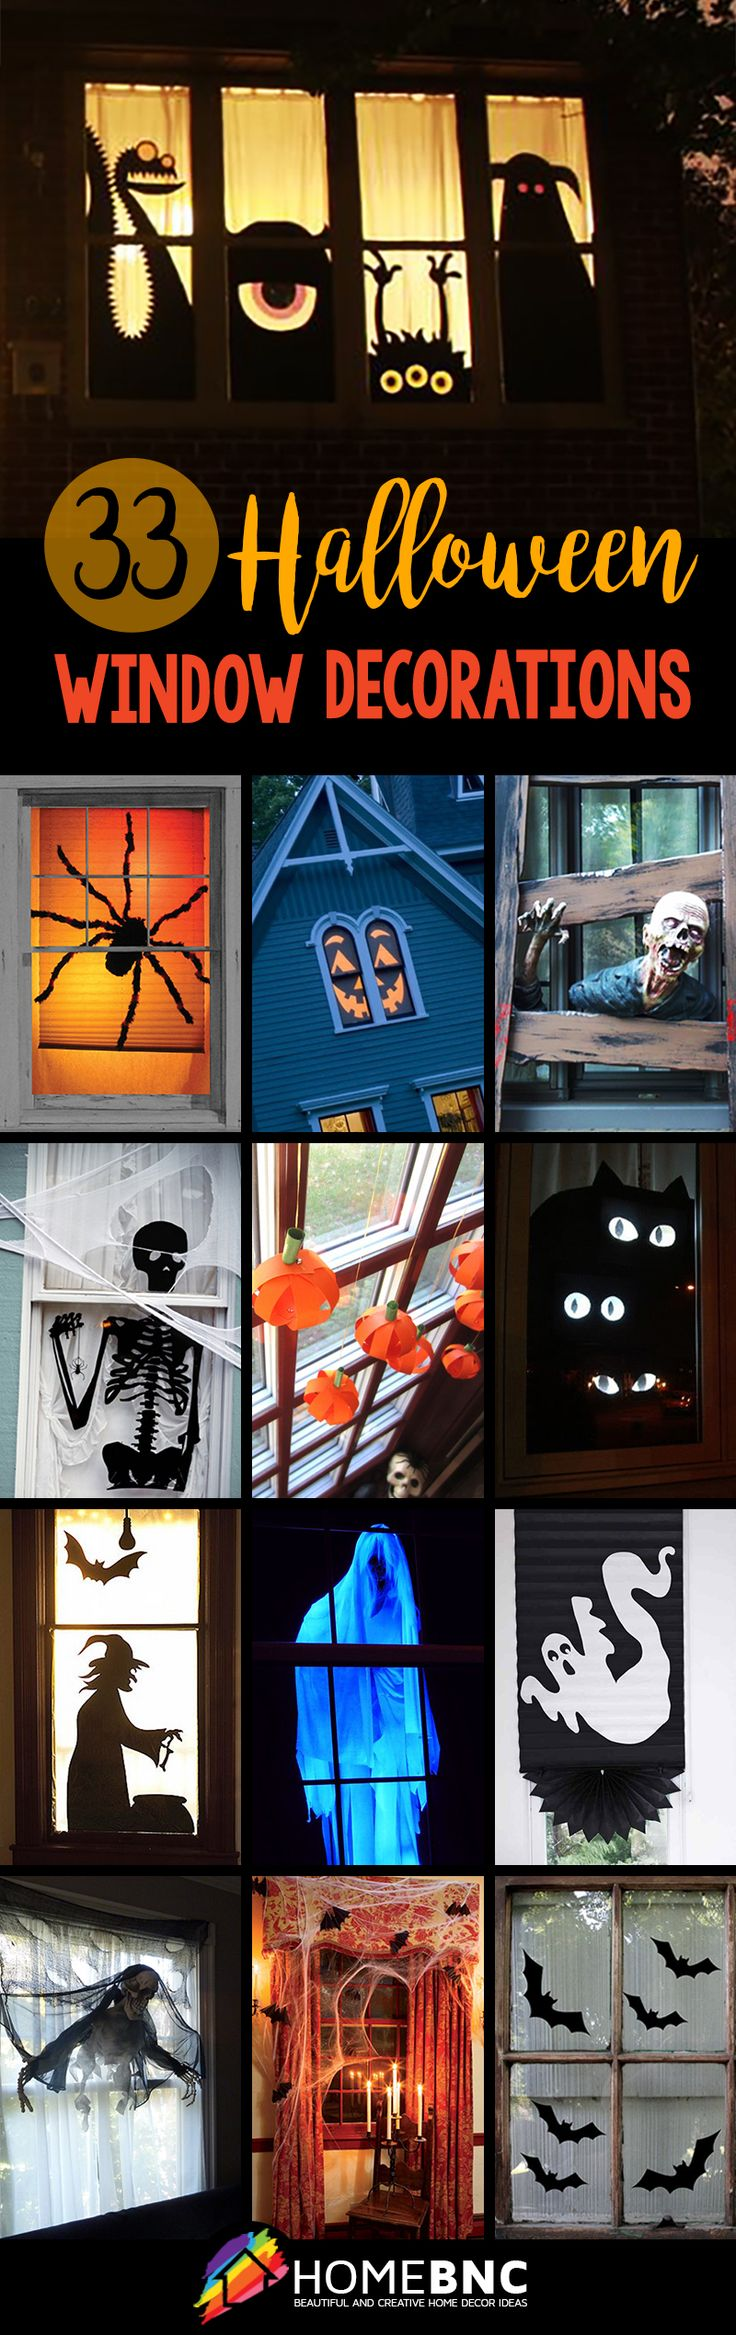 Halloween Window Decorations                                                                                                                                                                                 More